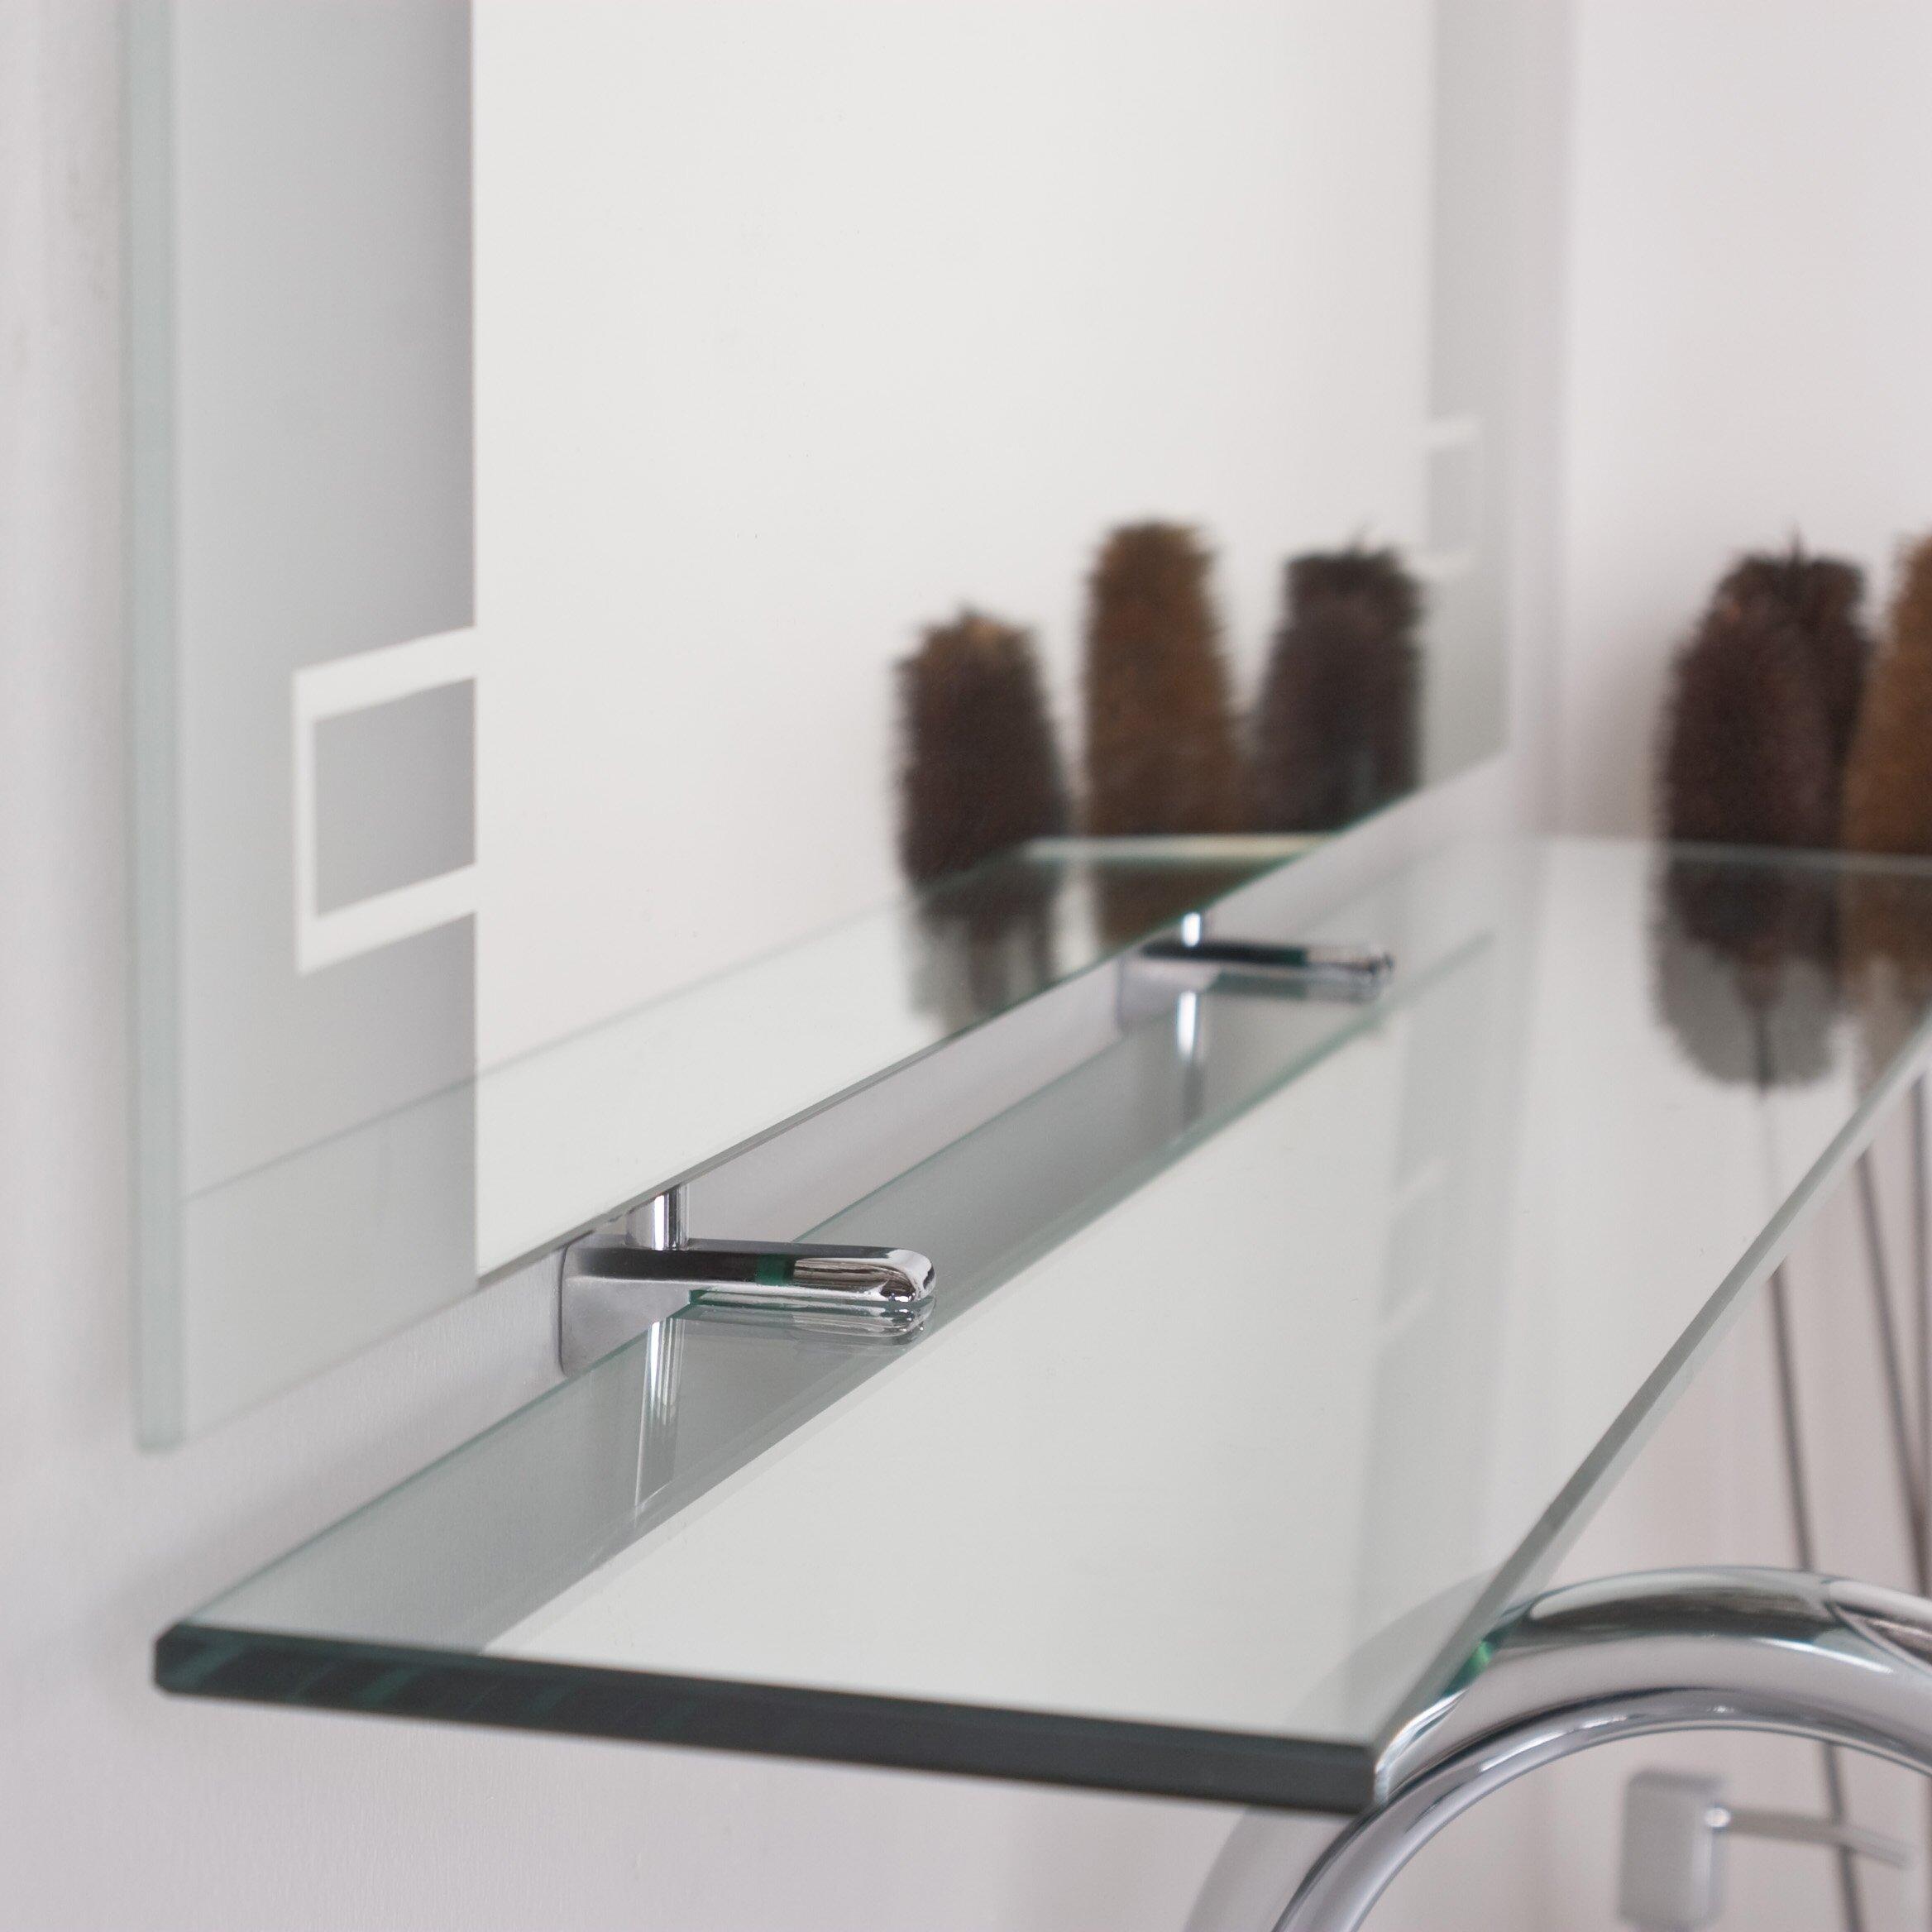 wade logan frameless wall mirror with shelf reviews. Black Bedroom Furniture Sets. Home Design Ideas